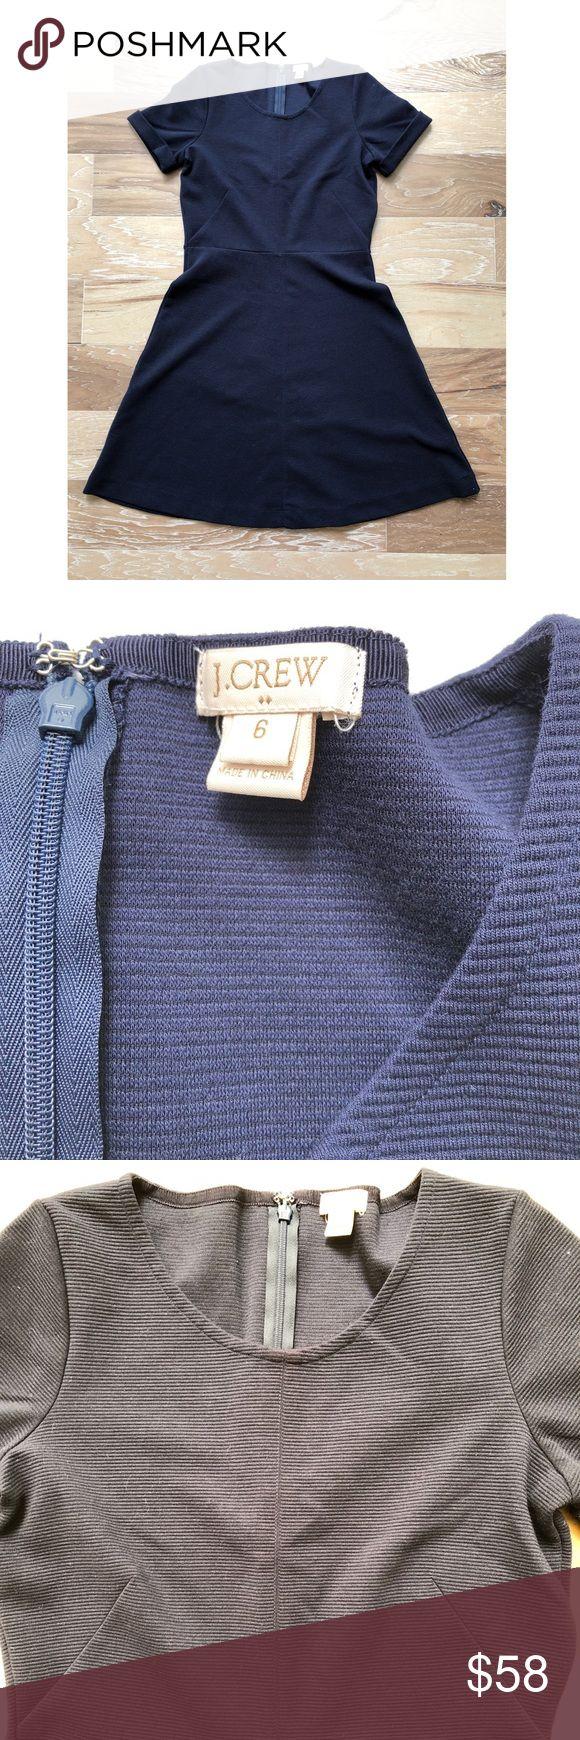 "J. Crew Navy Blue A-Line Dress J. Crew Navy Blue A-Line Dress in size 6. Approximate measurements: Pit to pit 17.5"", length 36"". Folded sleeve detail. EUC J. Crew Dresses Midi"